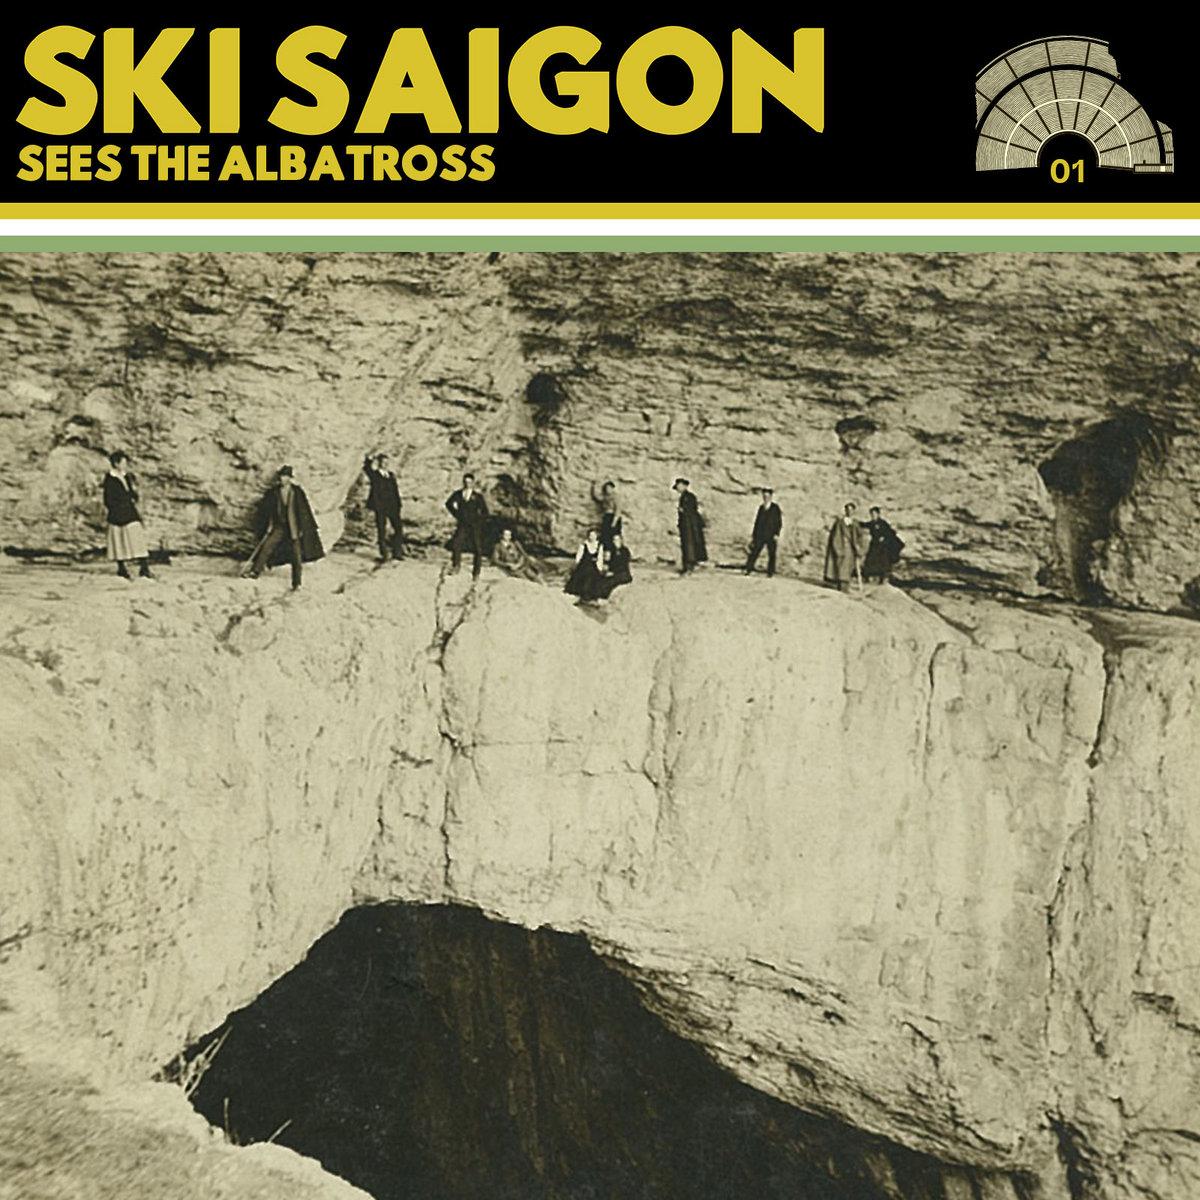 Ski Saigon